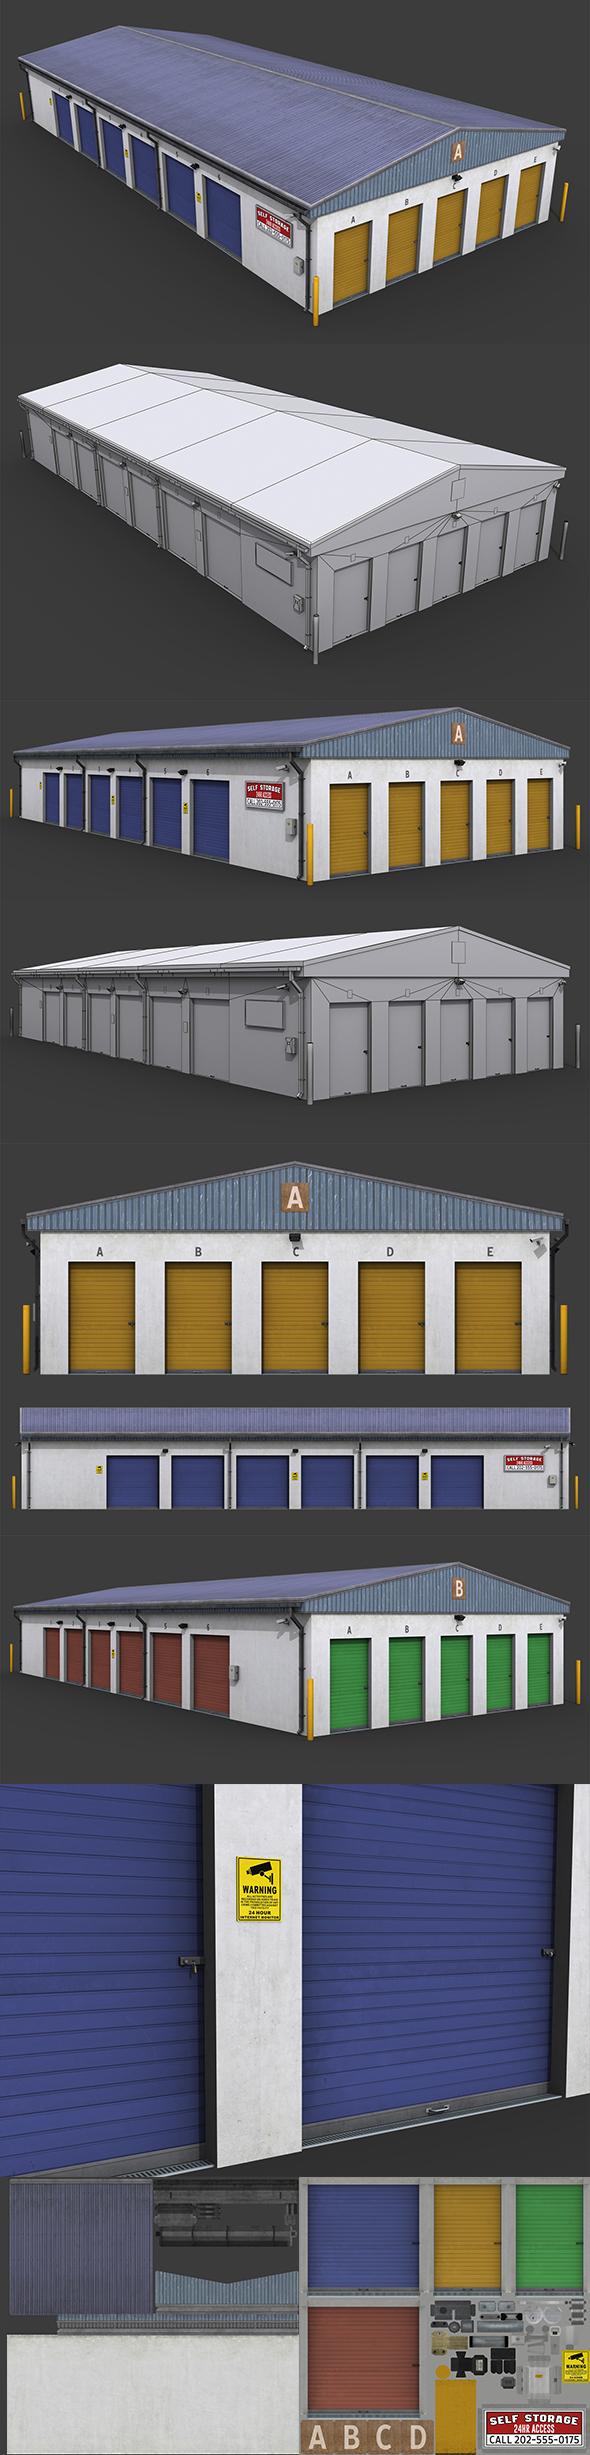 Selfstorage Warehouse Building - 3DOcean Item for Sale